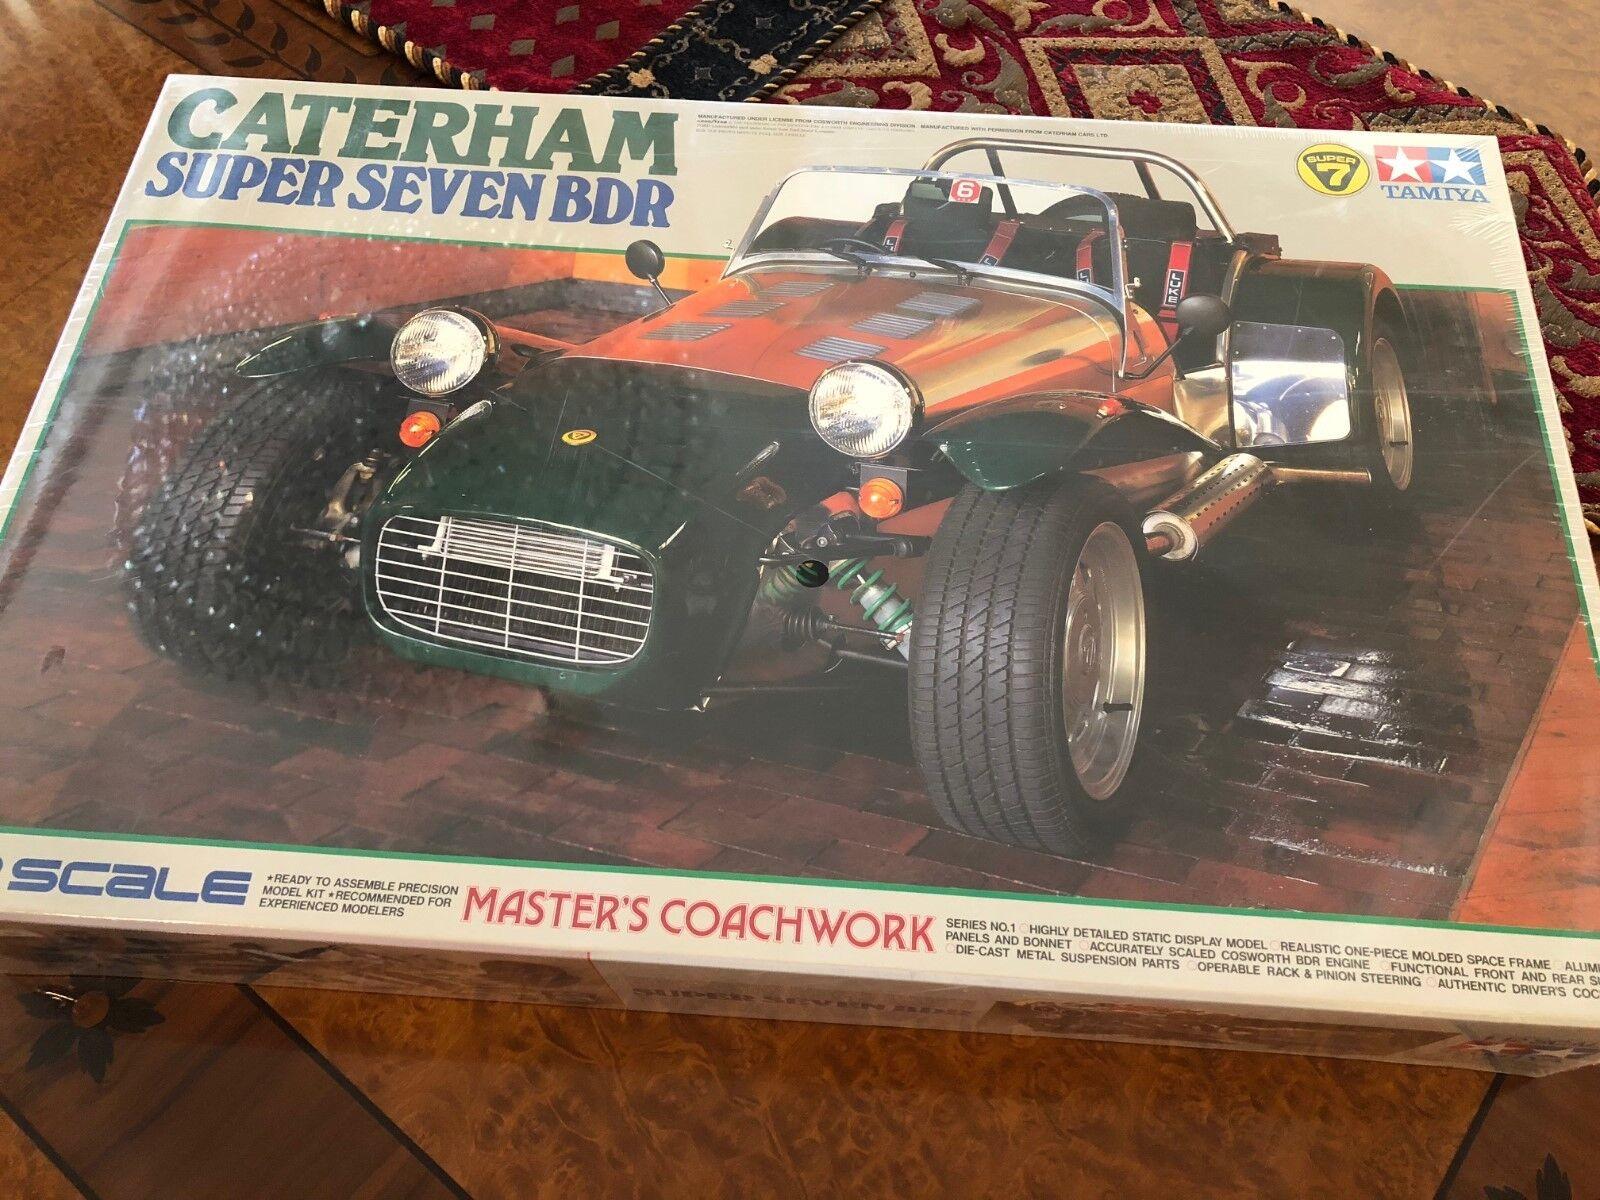 Tamiya   Neuf Scellé   1 12 Kit   Caterham Super 7 Bdr   Master's Carrosserie